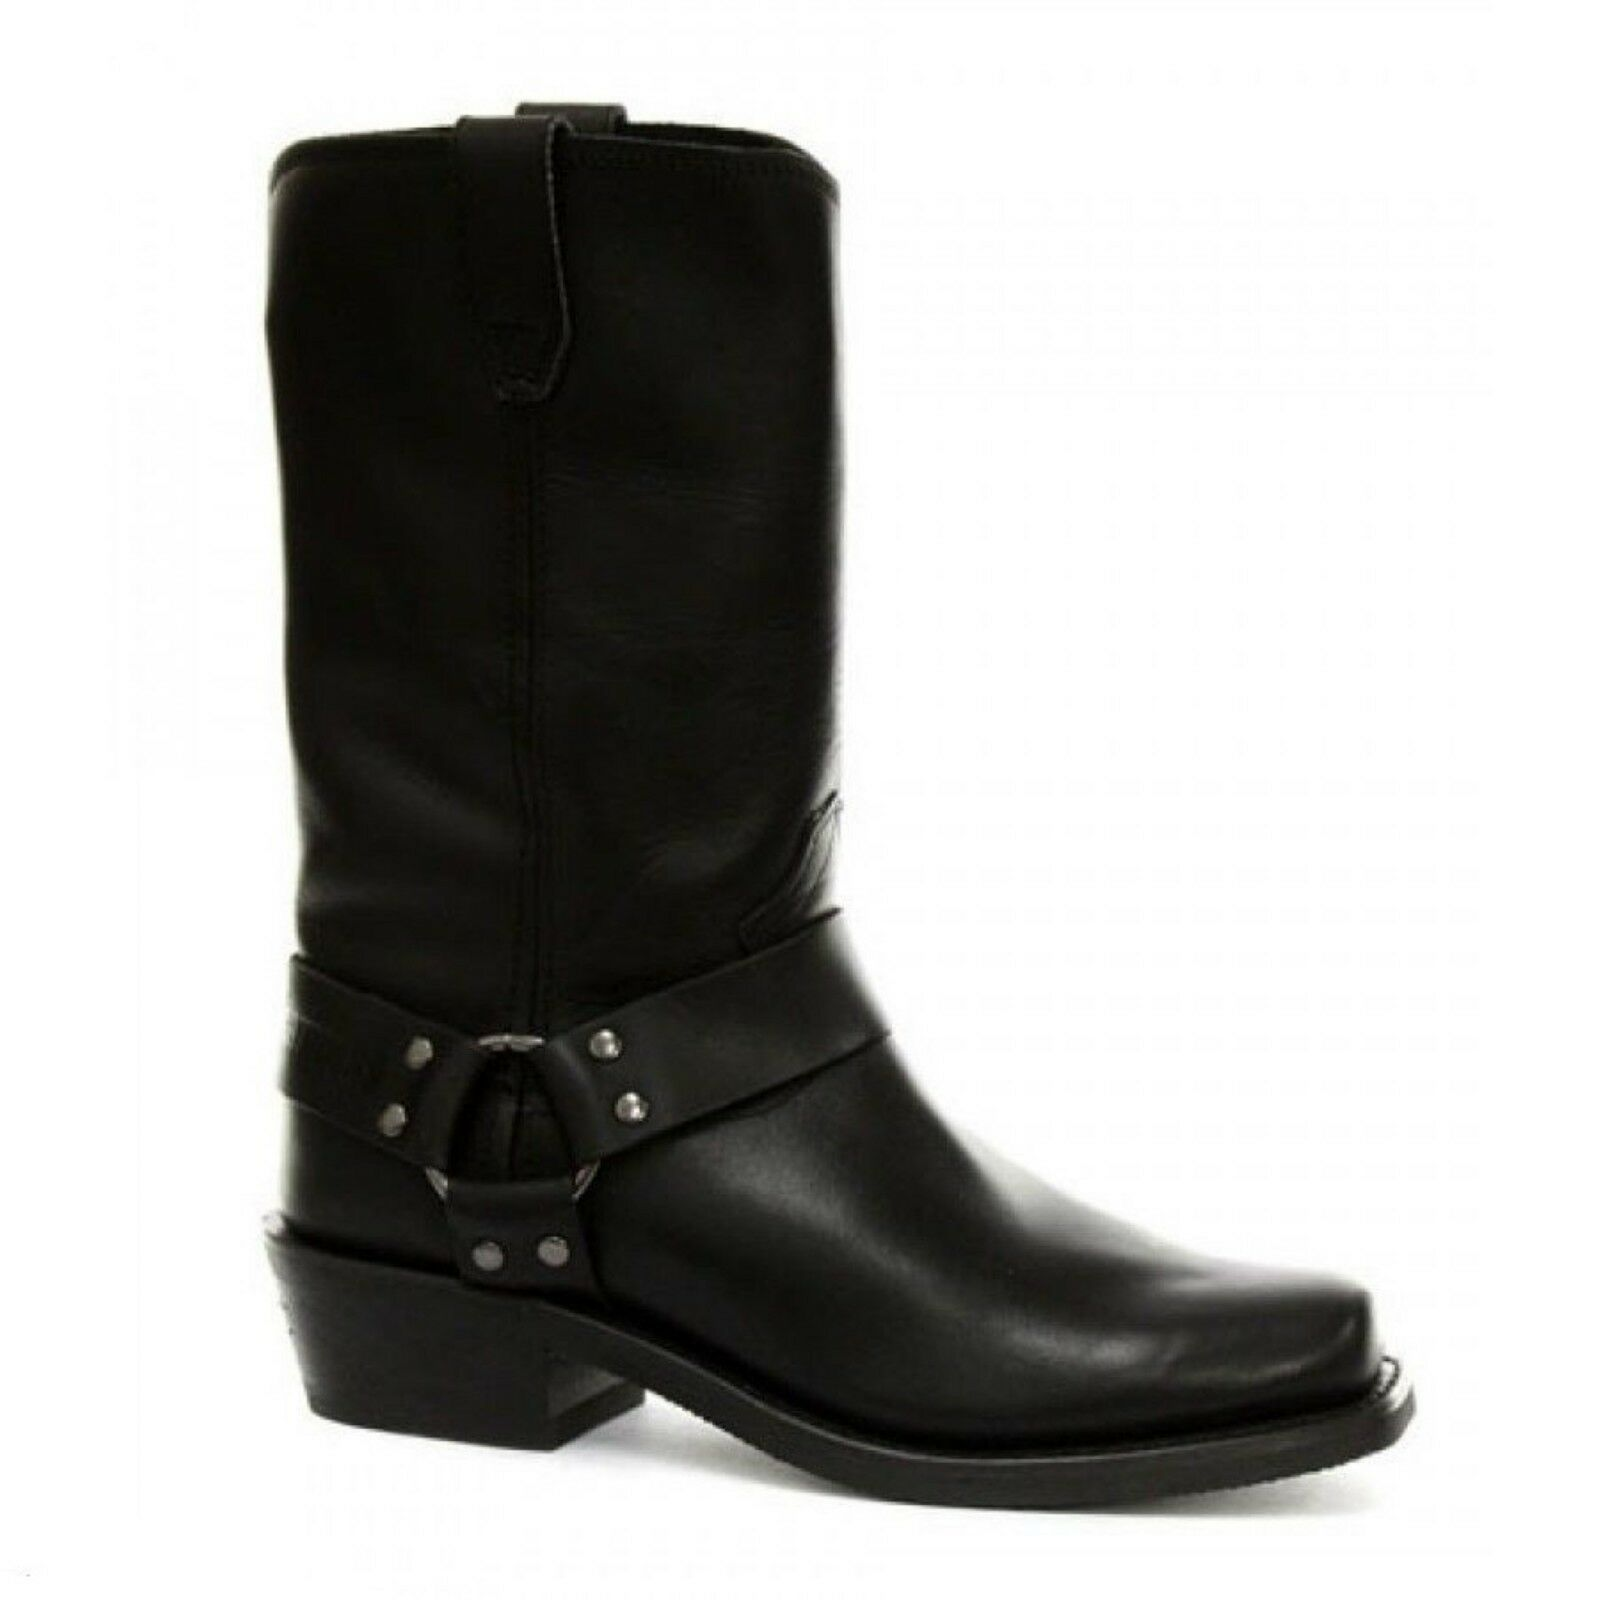 Grinders Rare Old Waxy Renegade Unisex Hi Biker Black Leather Boots